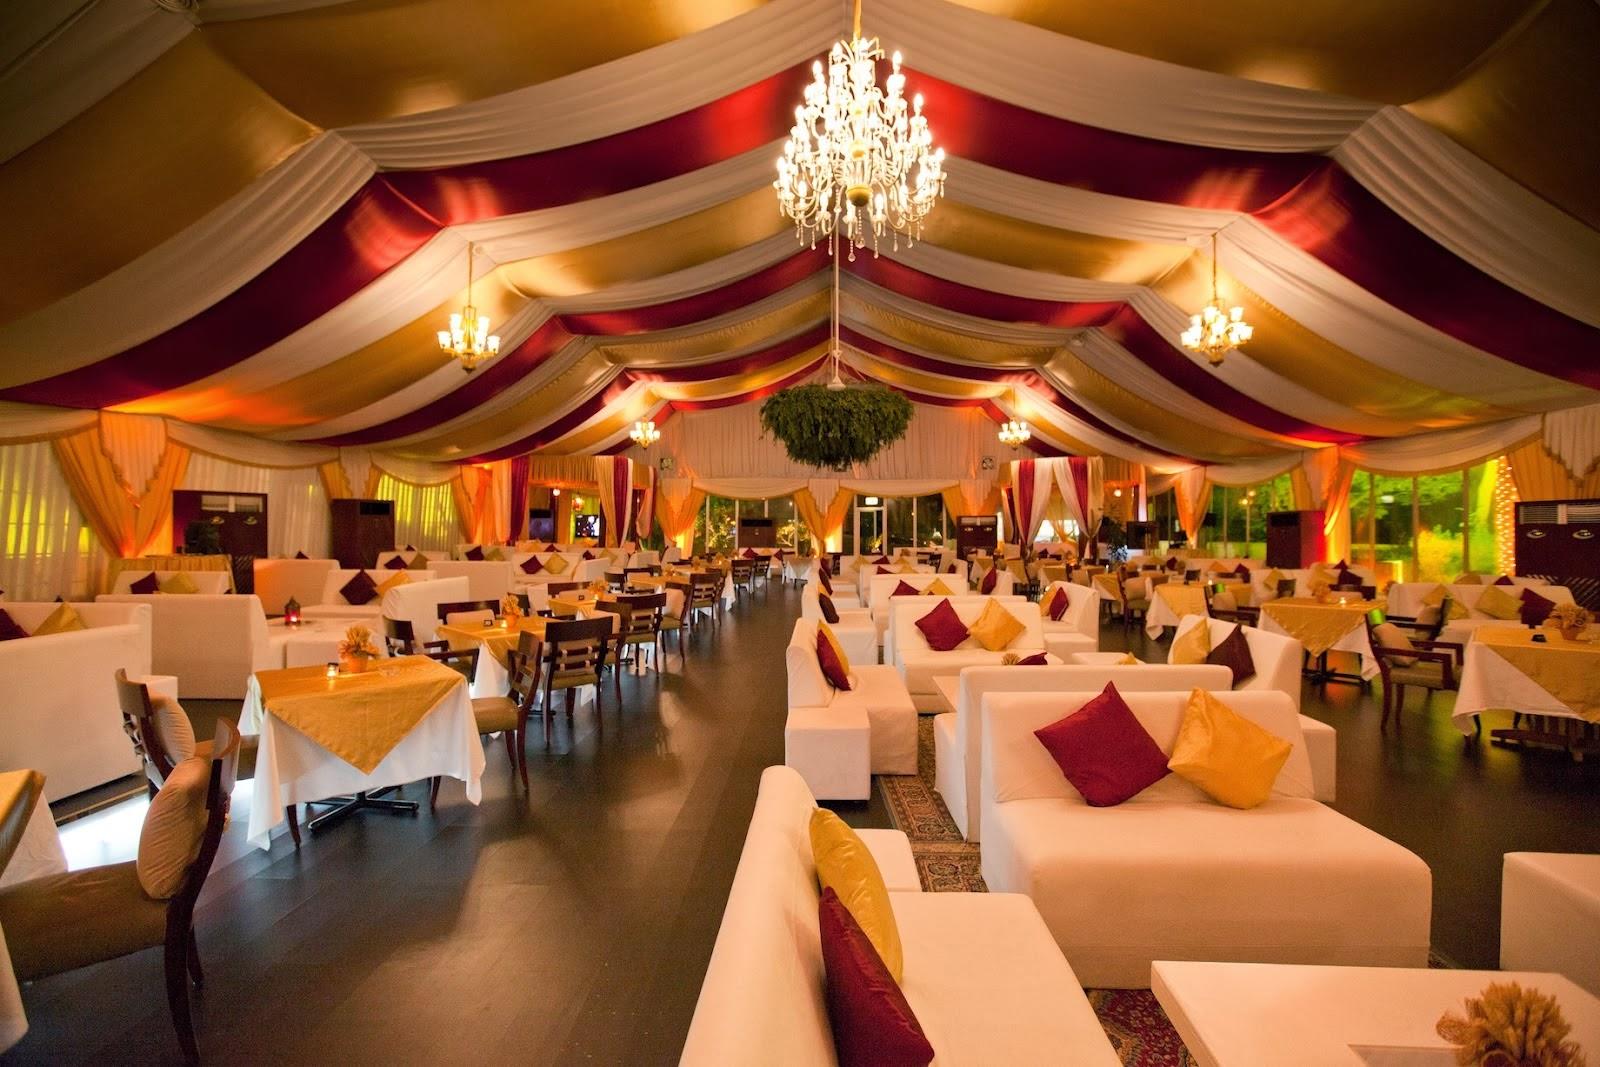 Party Tent Rental Dubai Abu Dhabi Uae Al Ameera